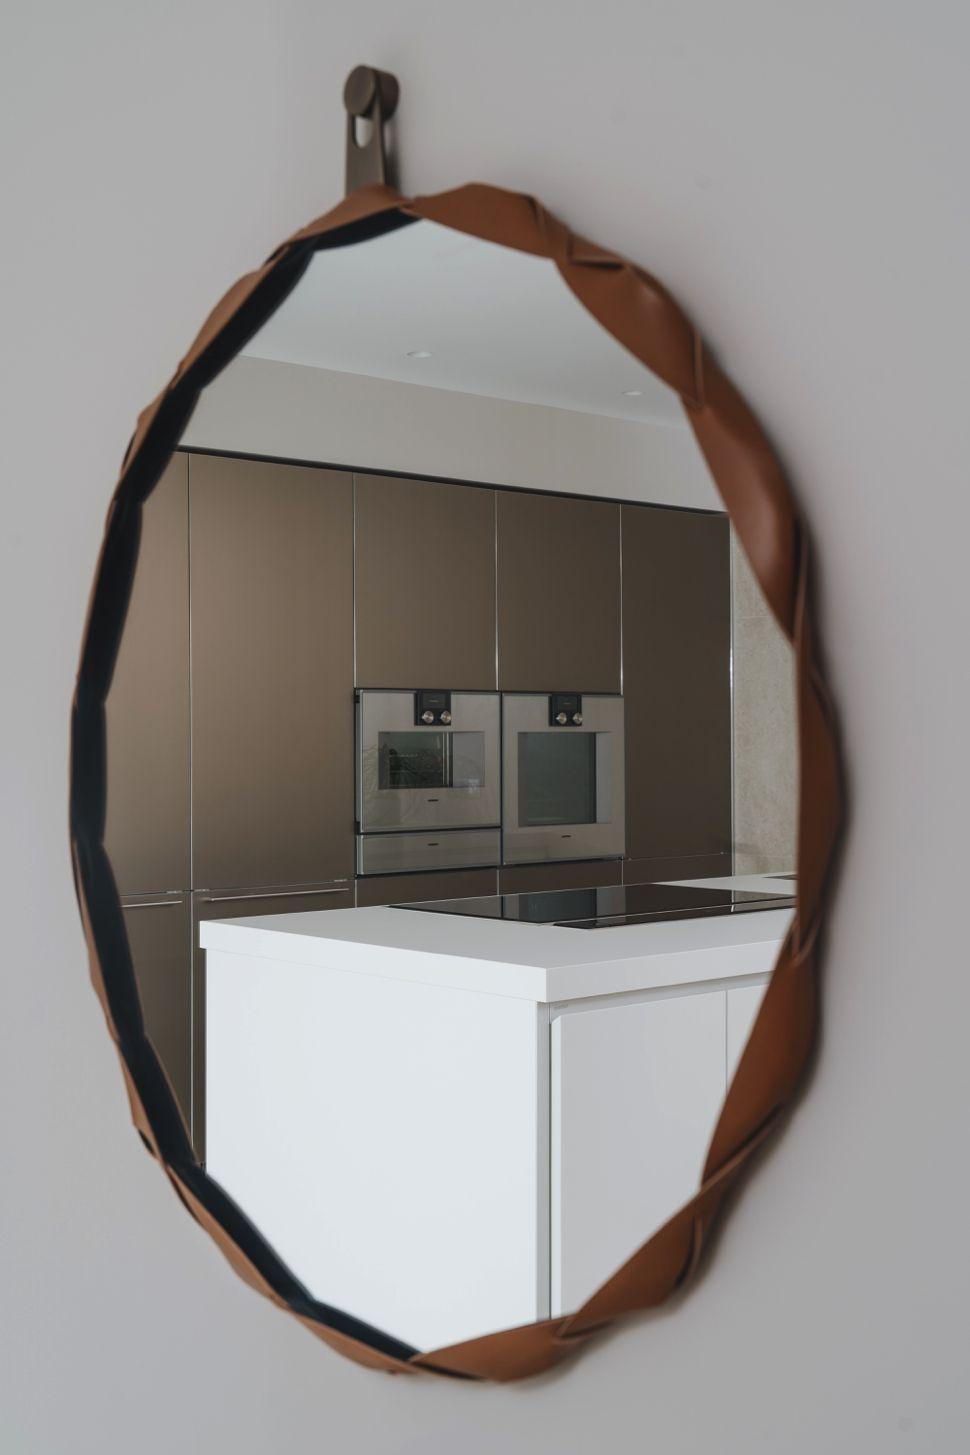 bulthaup-sagaseta-vivir-la-cocina